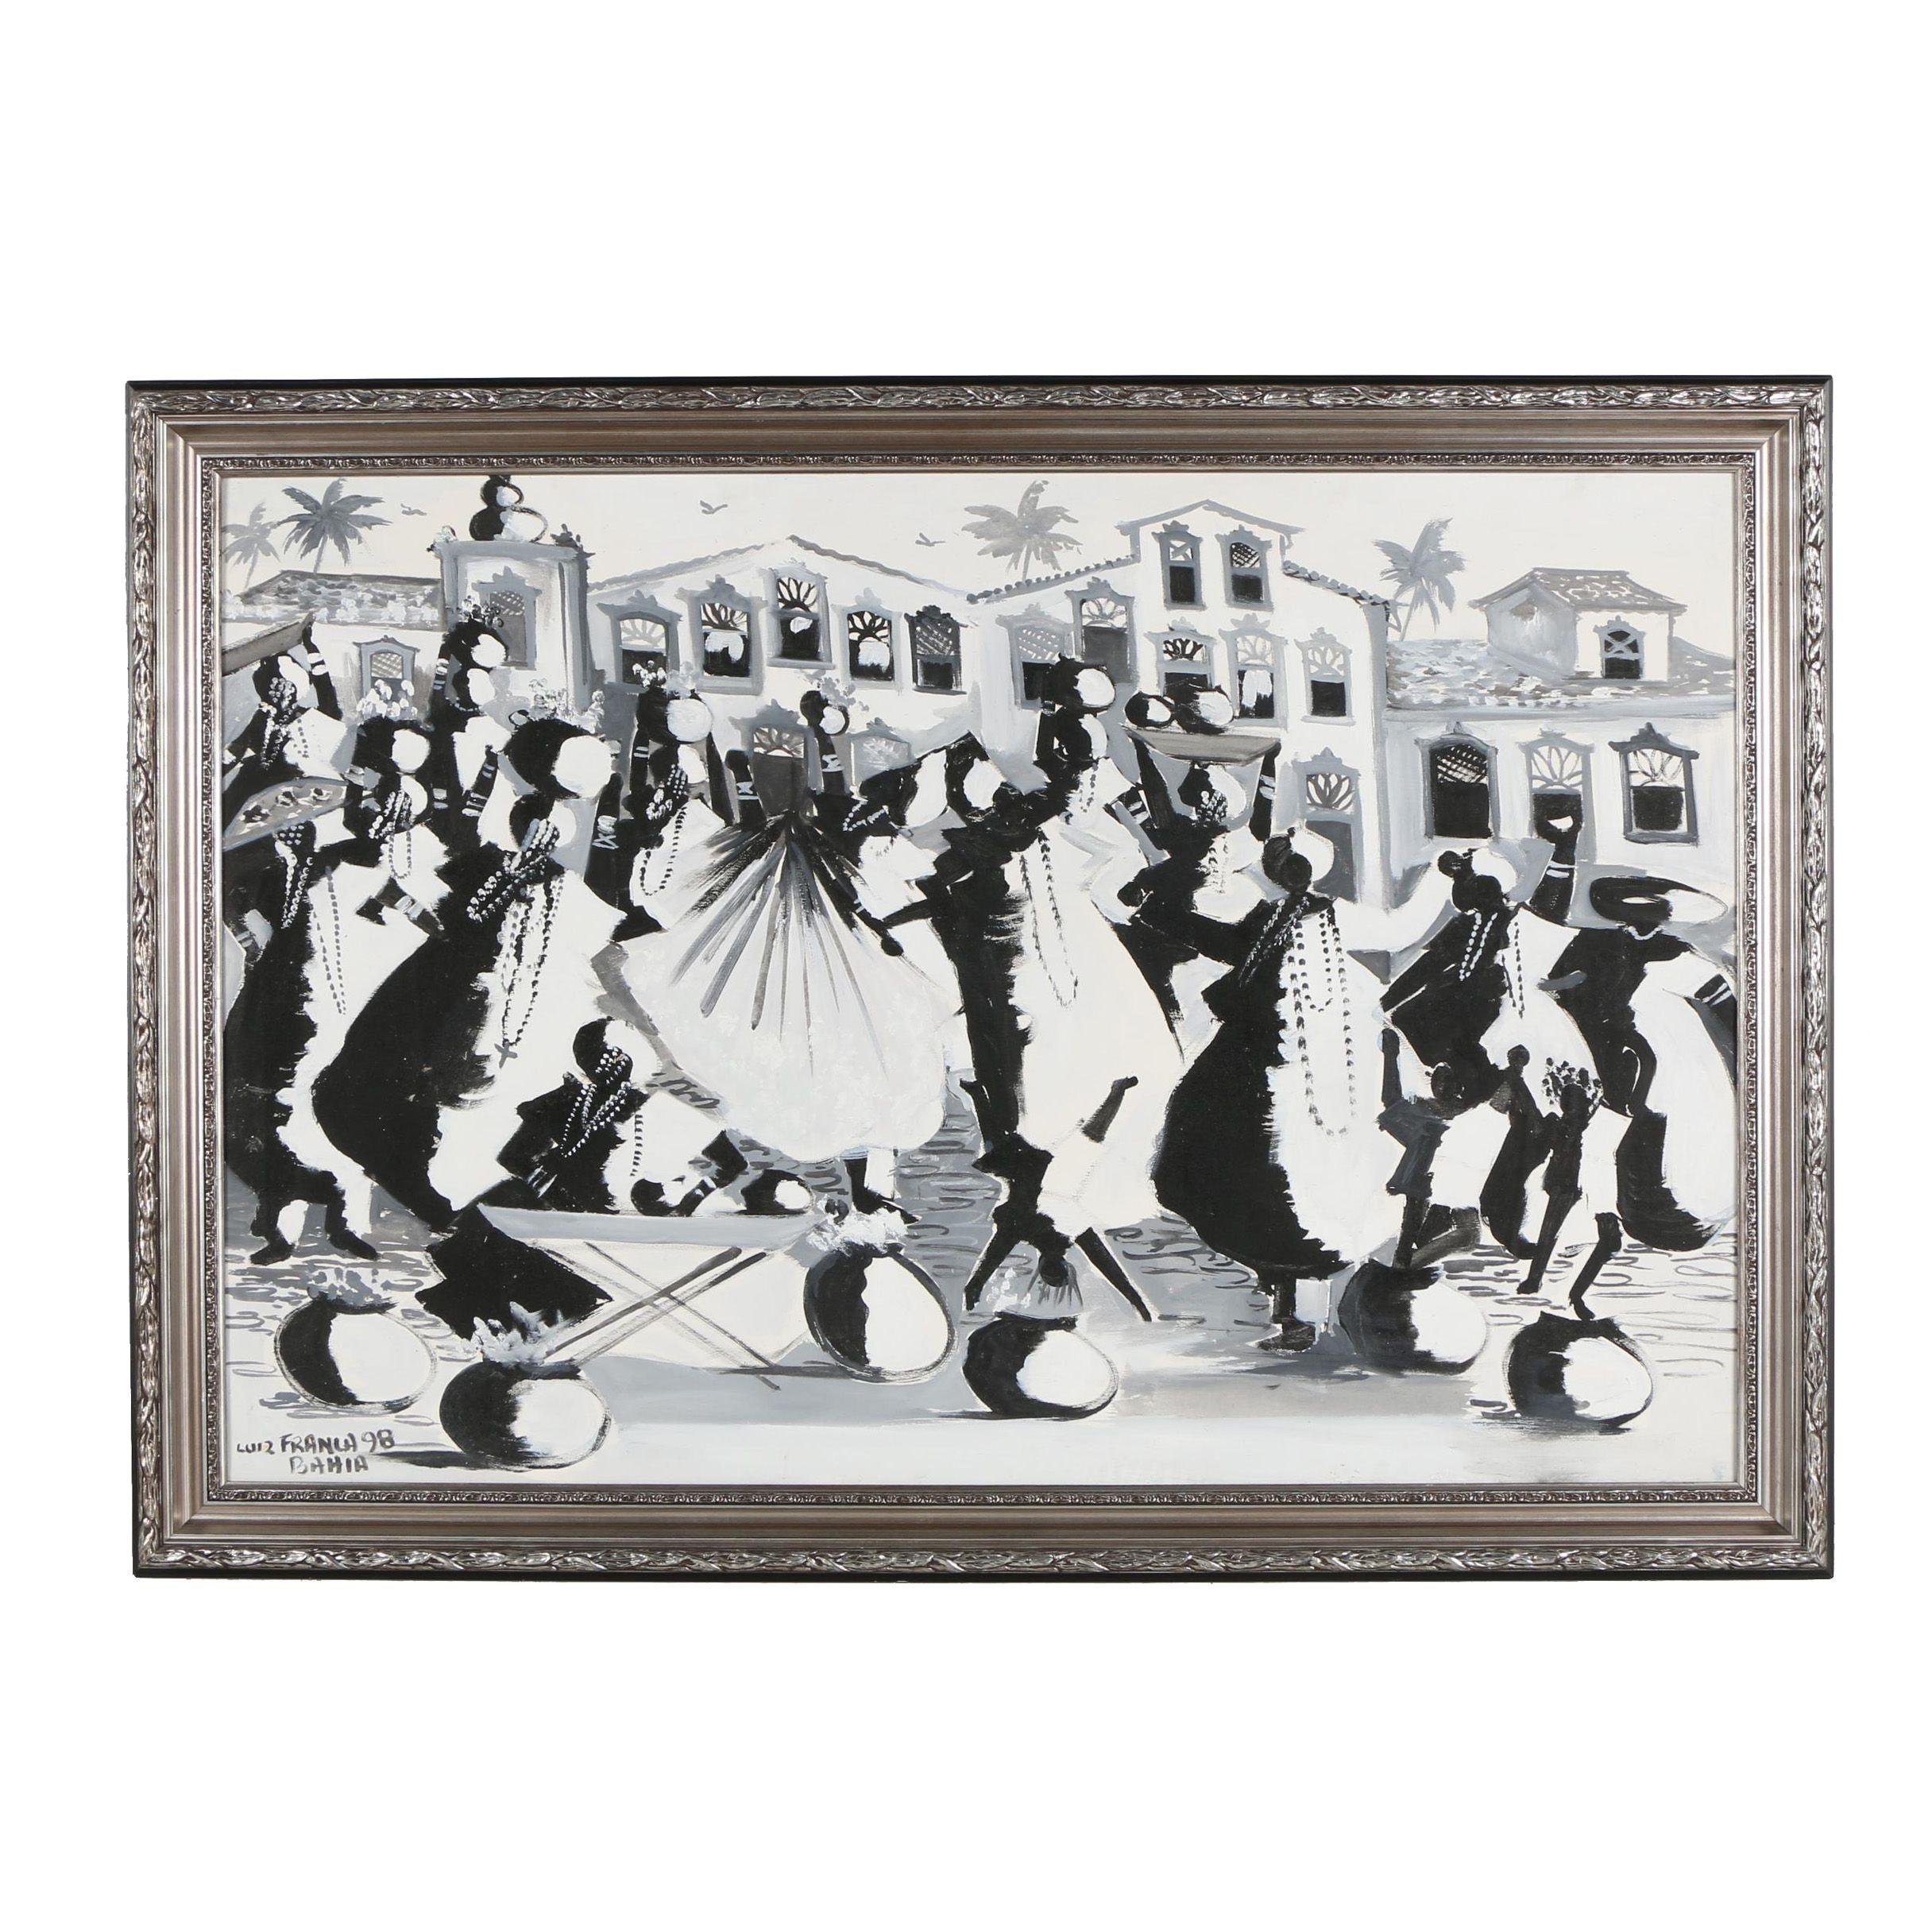 Luiz Franca Acrylic Painting of Figures Walking in Parade